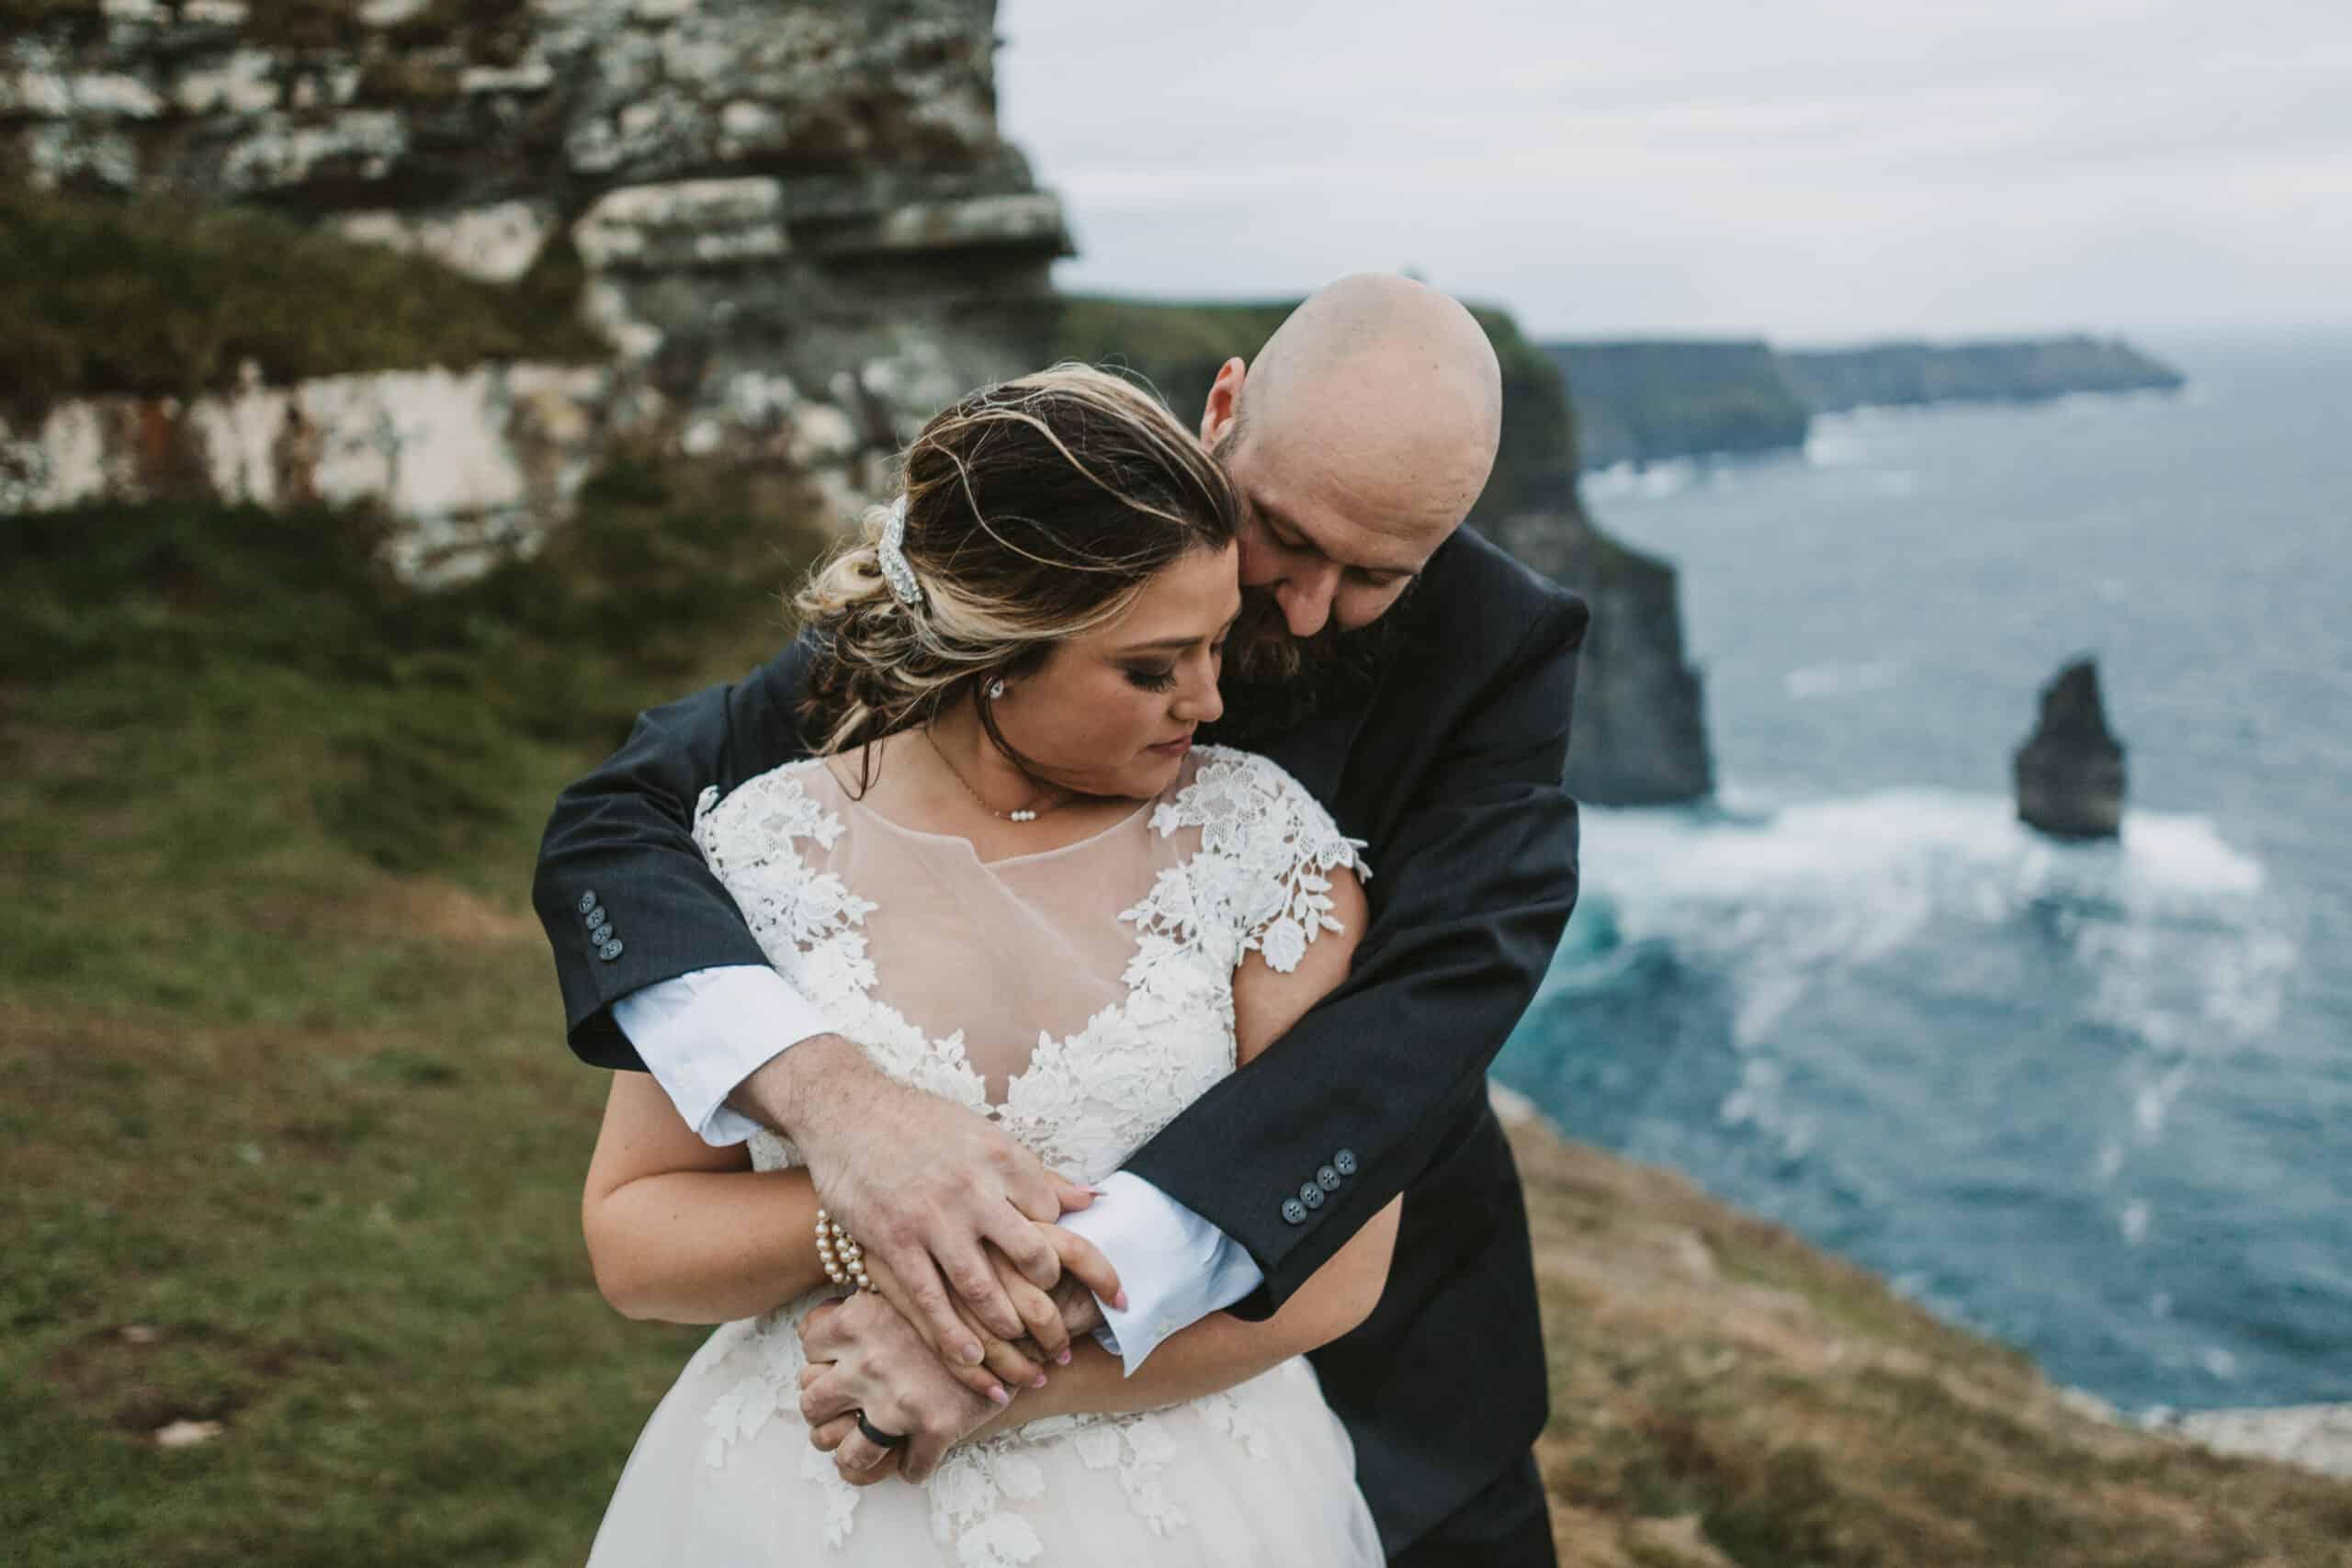 Cliffs of Moher Wedding Hags head, groom puts arms around bride